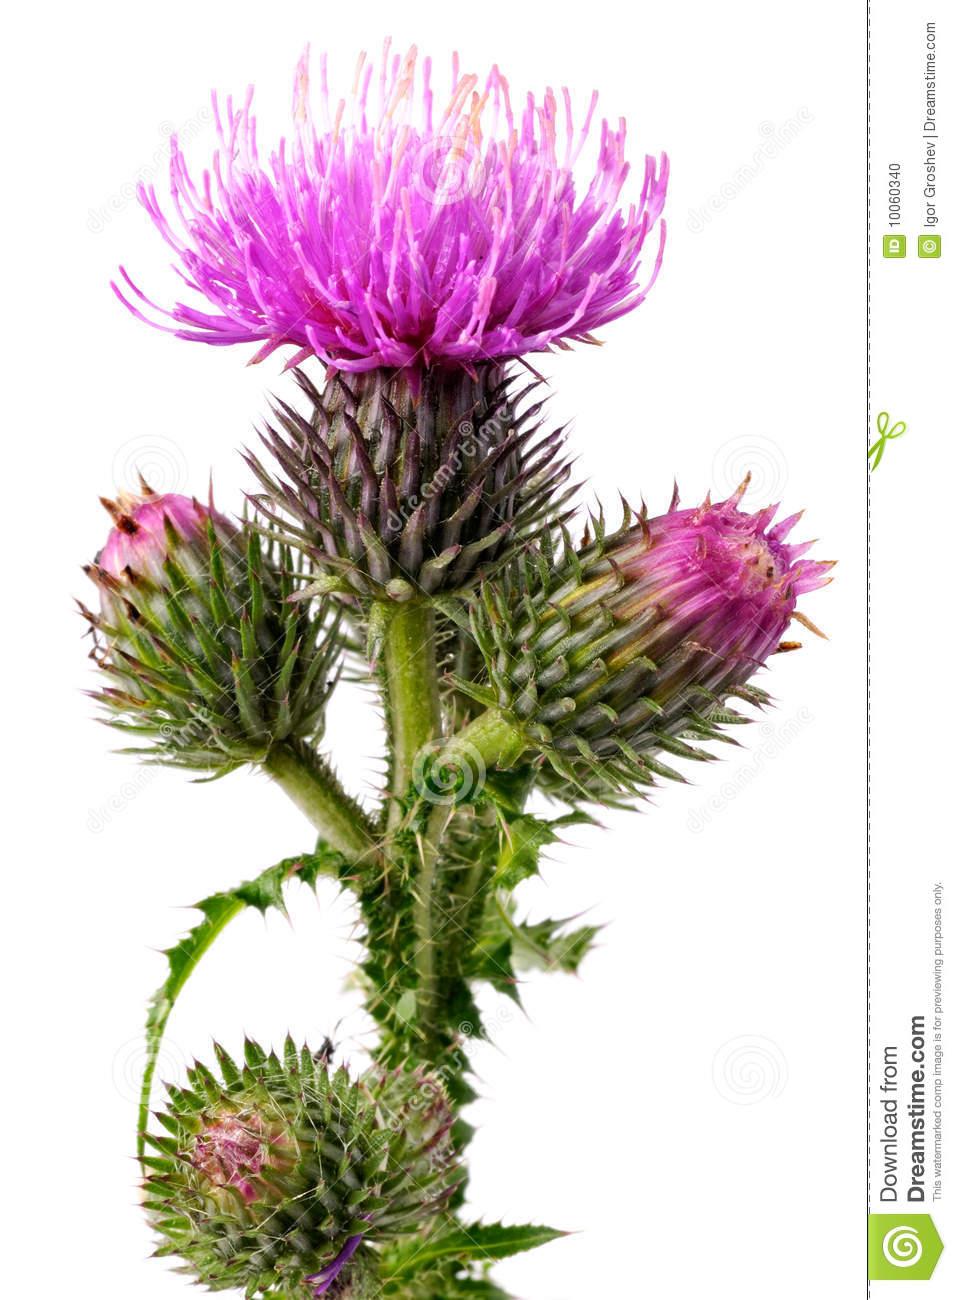 Burdock Flowers Stock Photo.